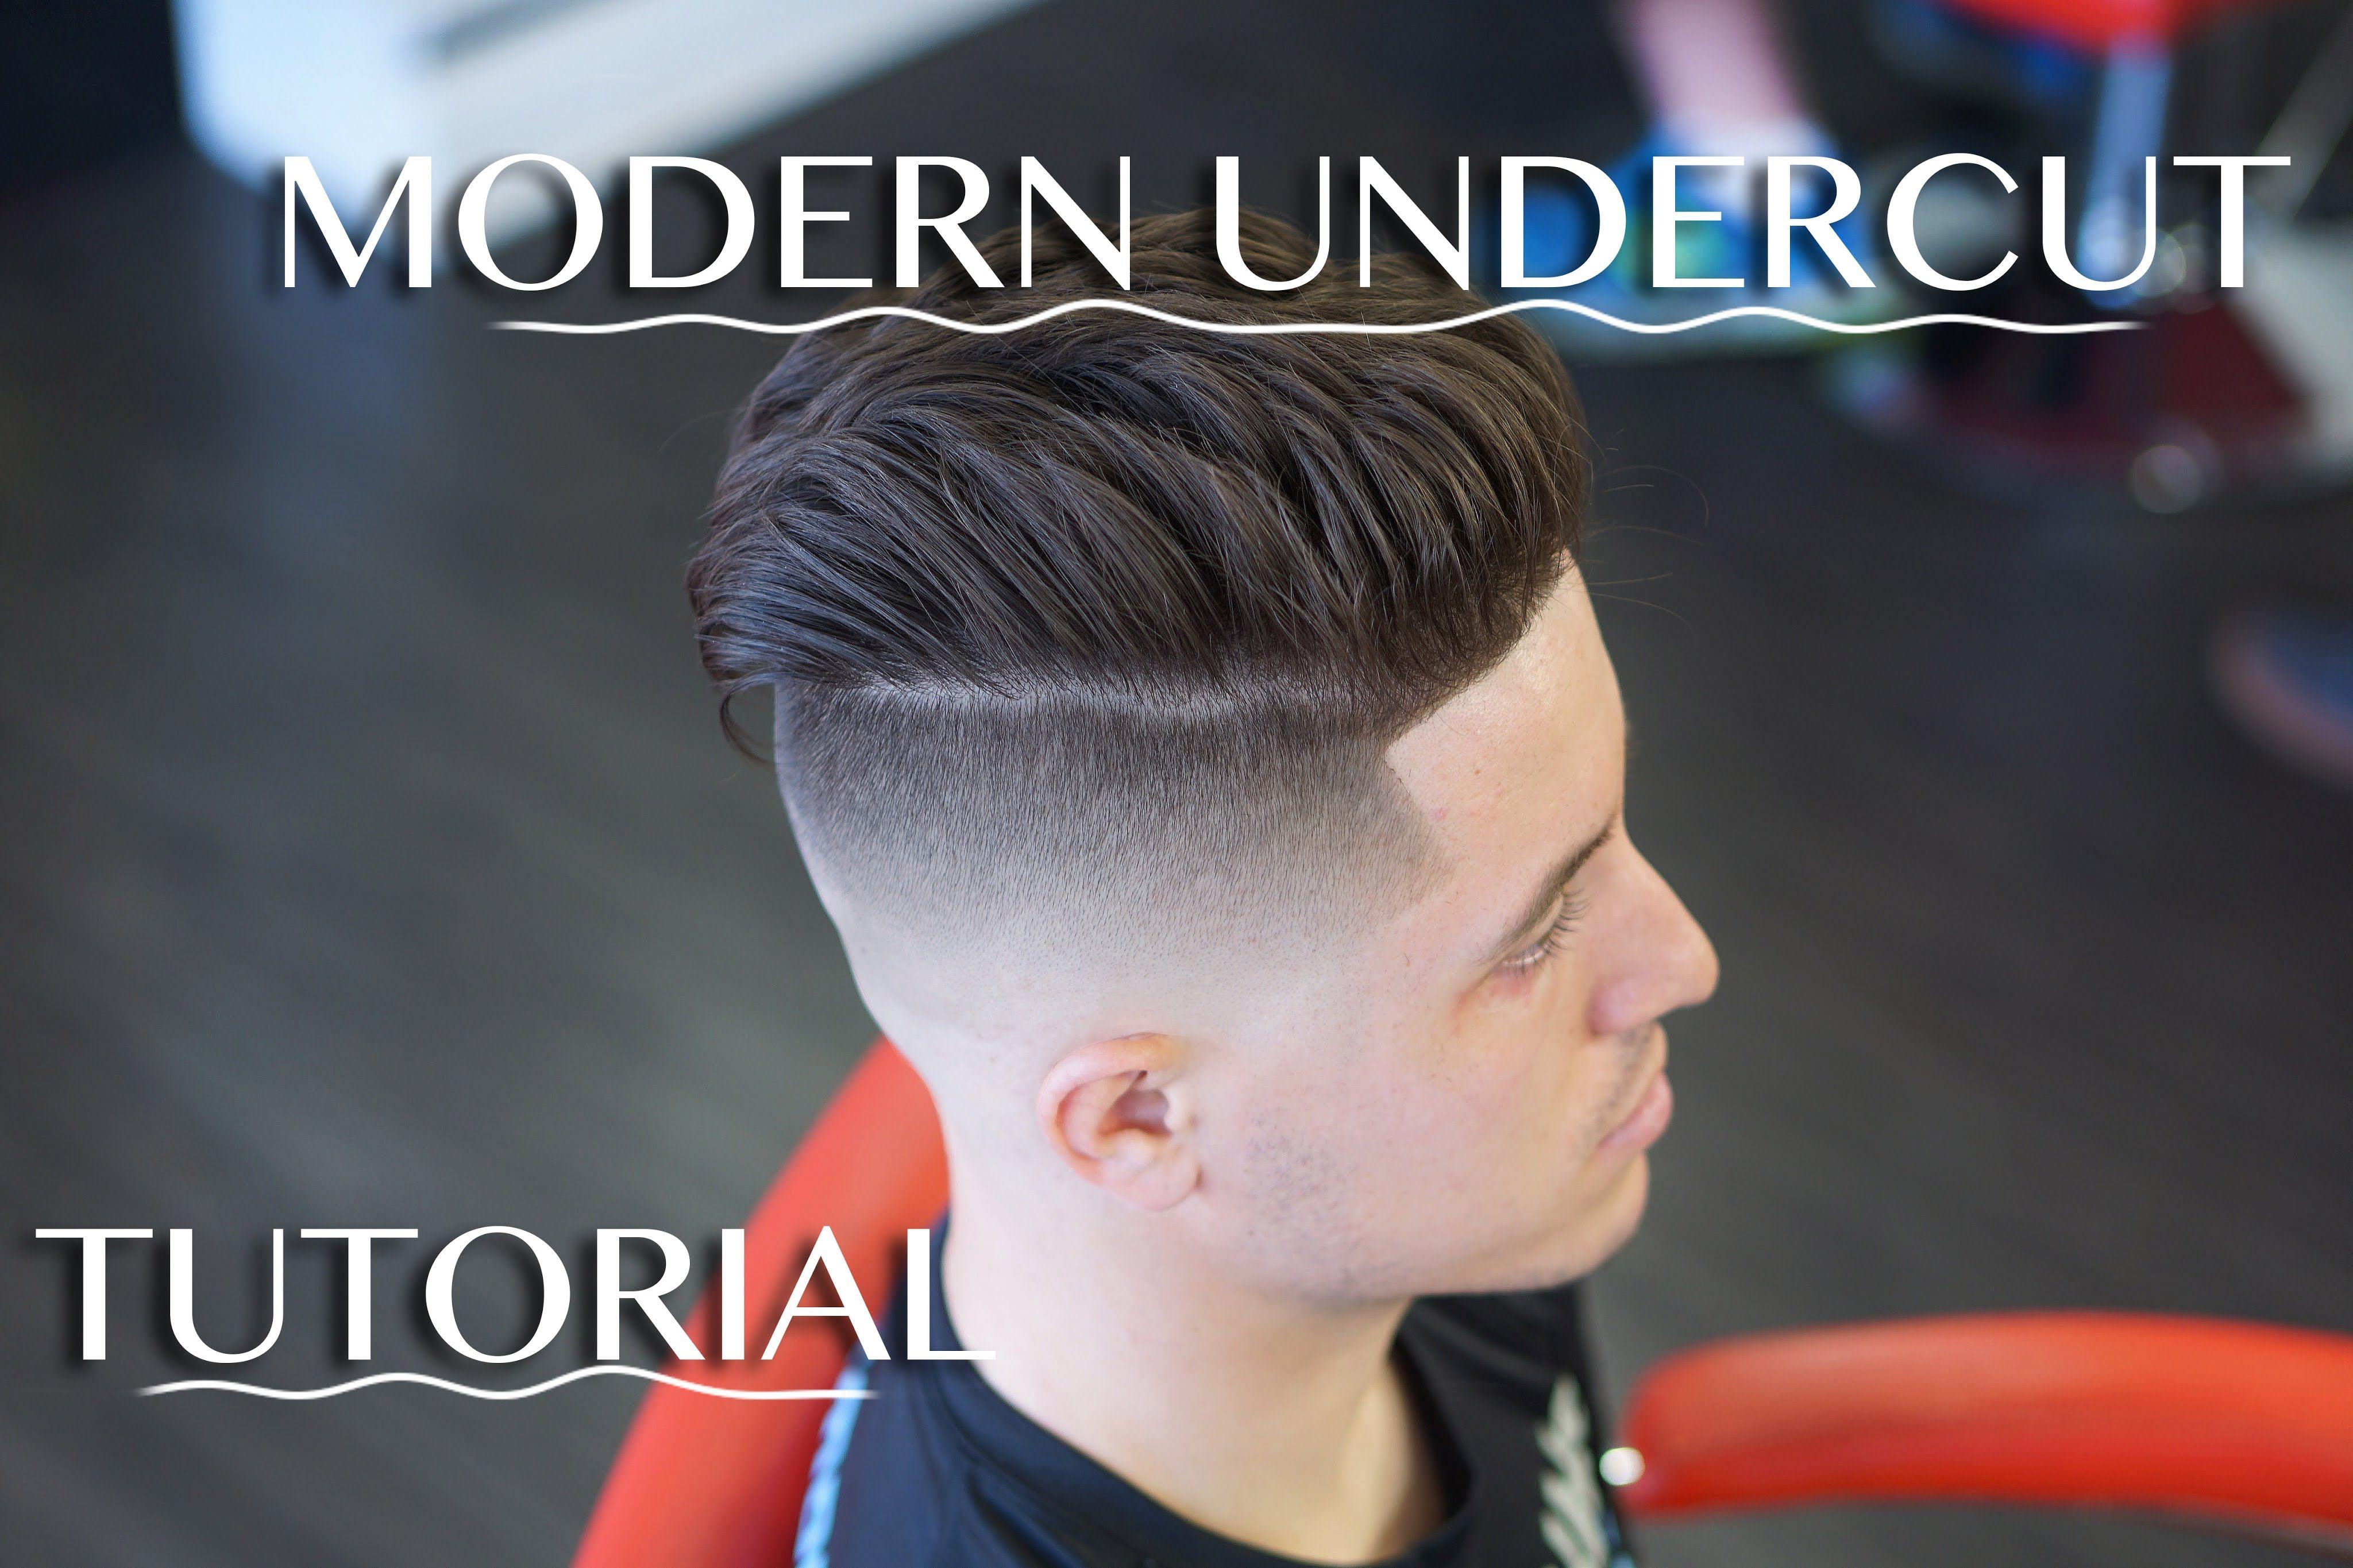 High Fade Undercut Step By Step Tutorial How To Undercut Mens Hairstyles Undercut Mens Hairstyles